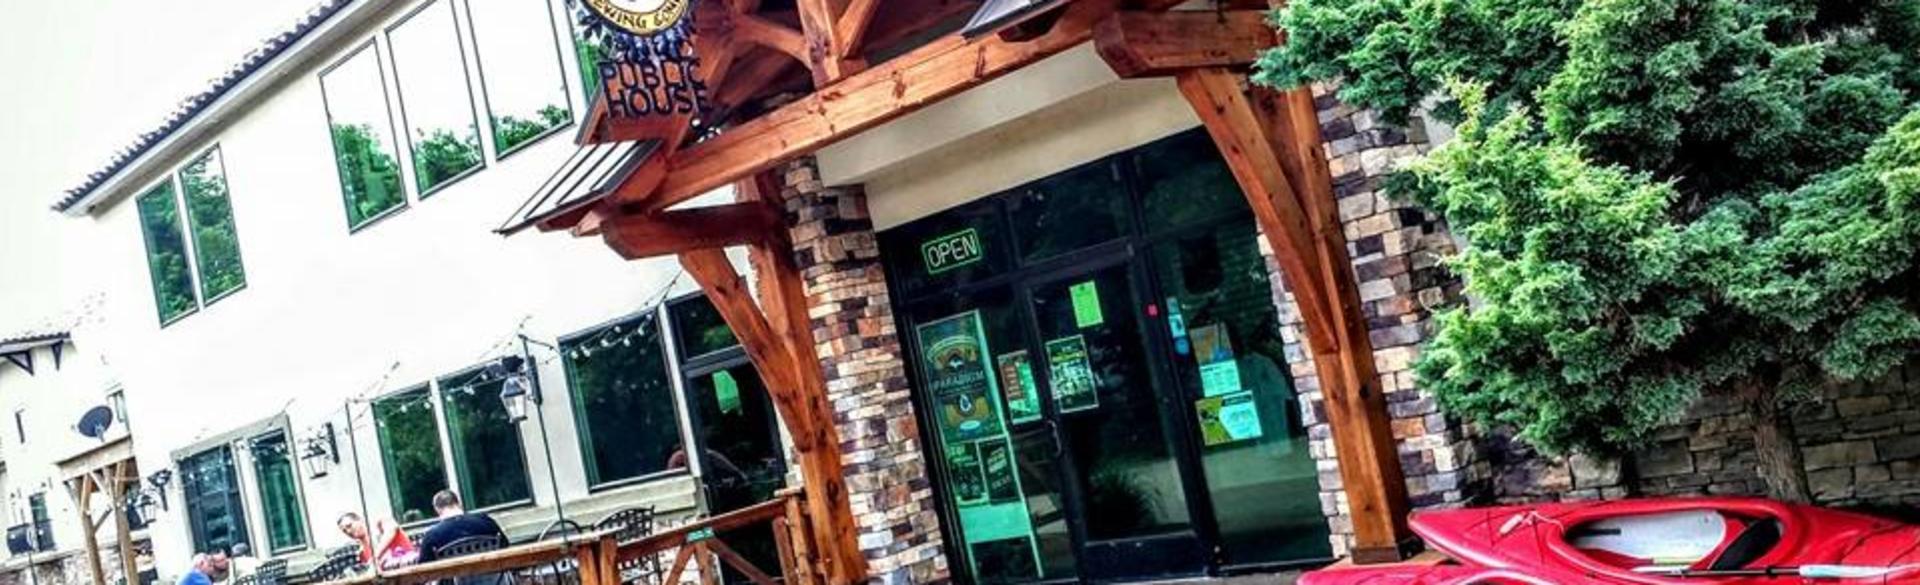 Rockford Brewing. Photo credit: Rockford Brewing